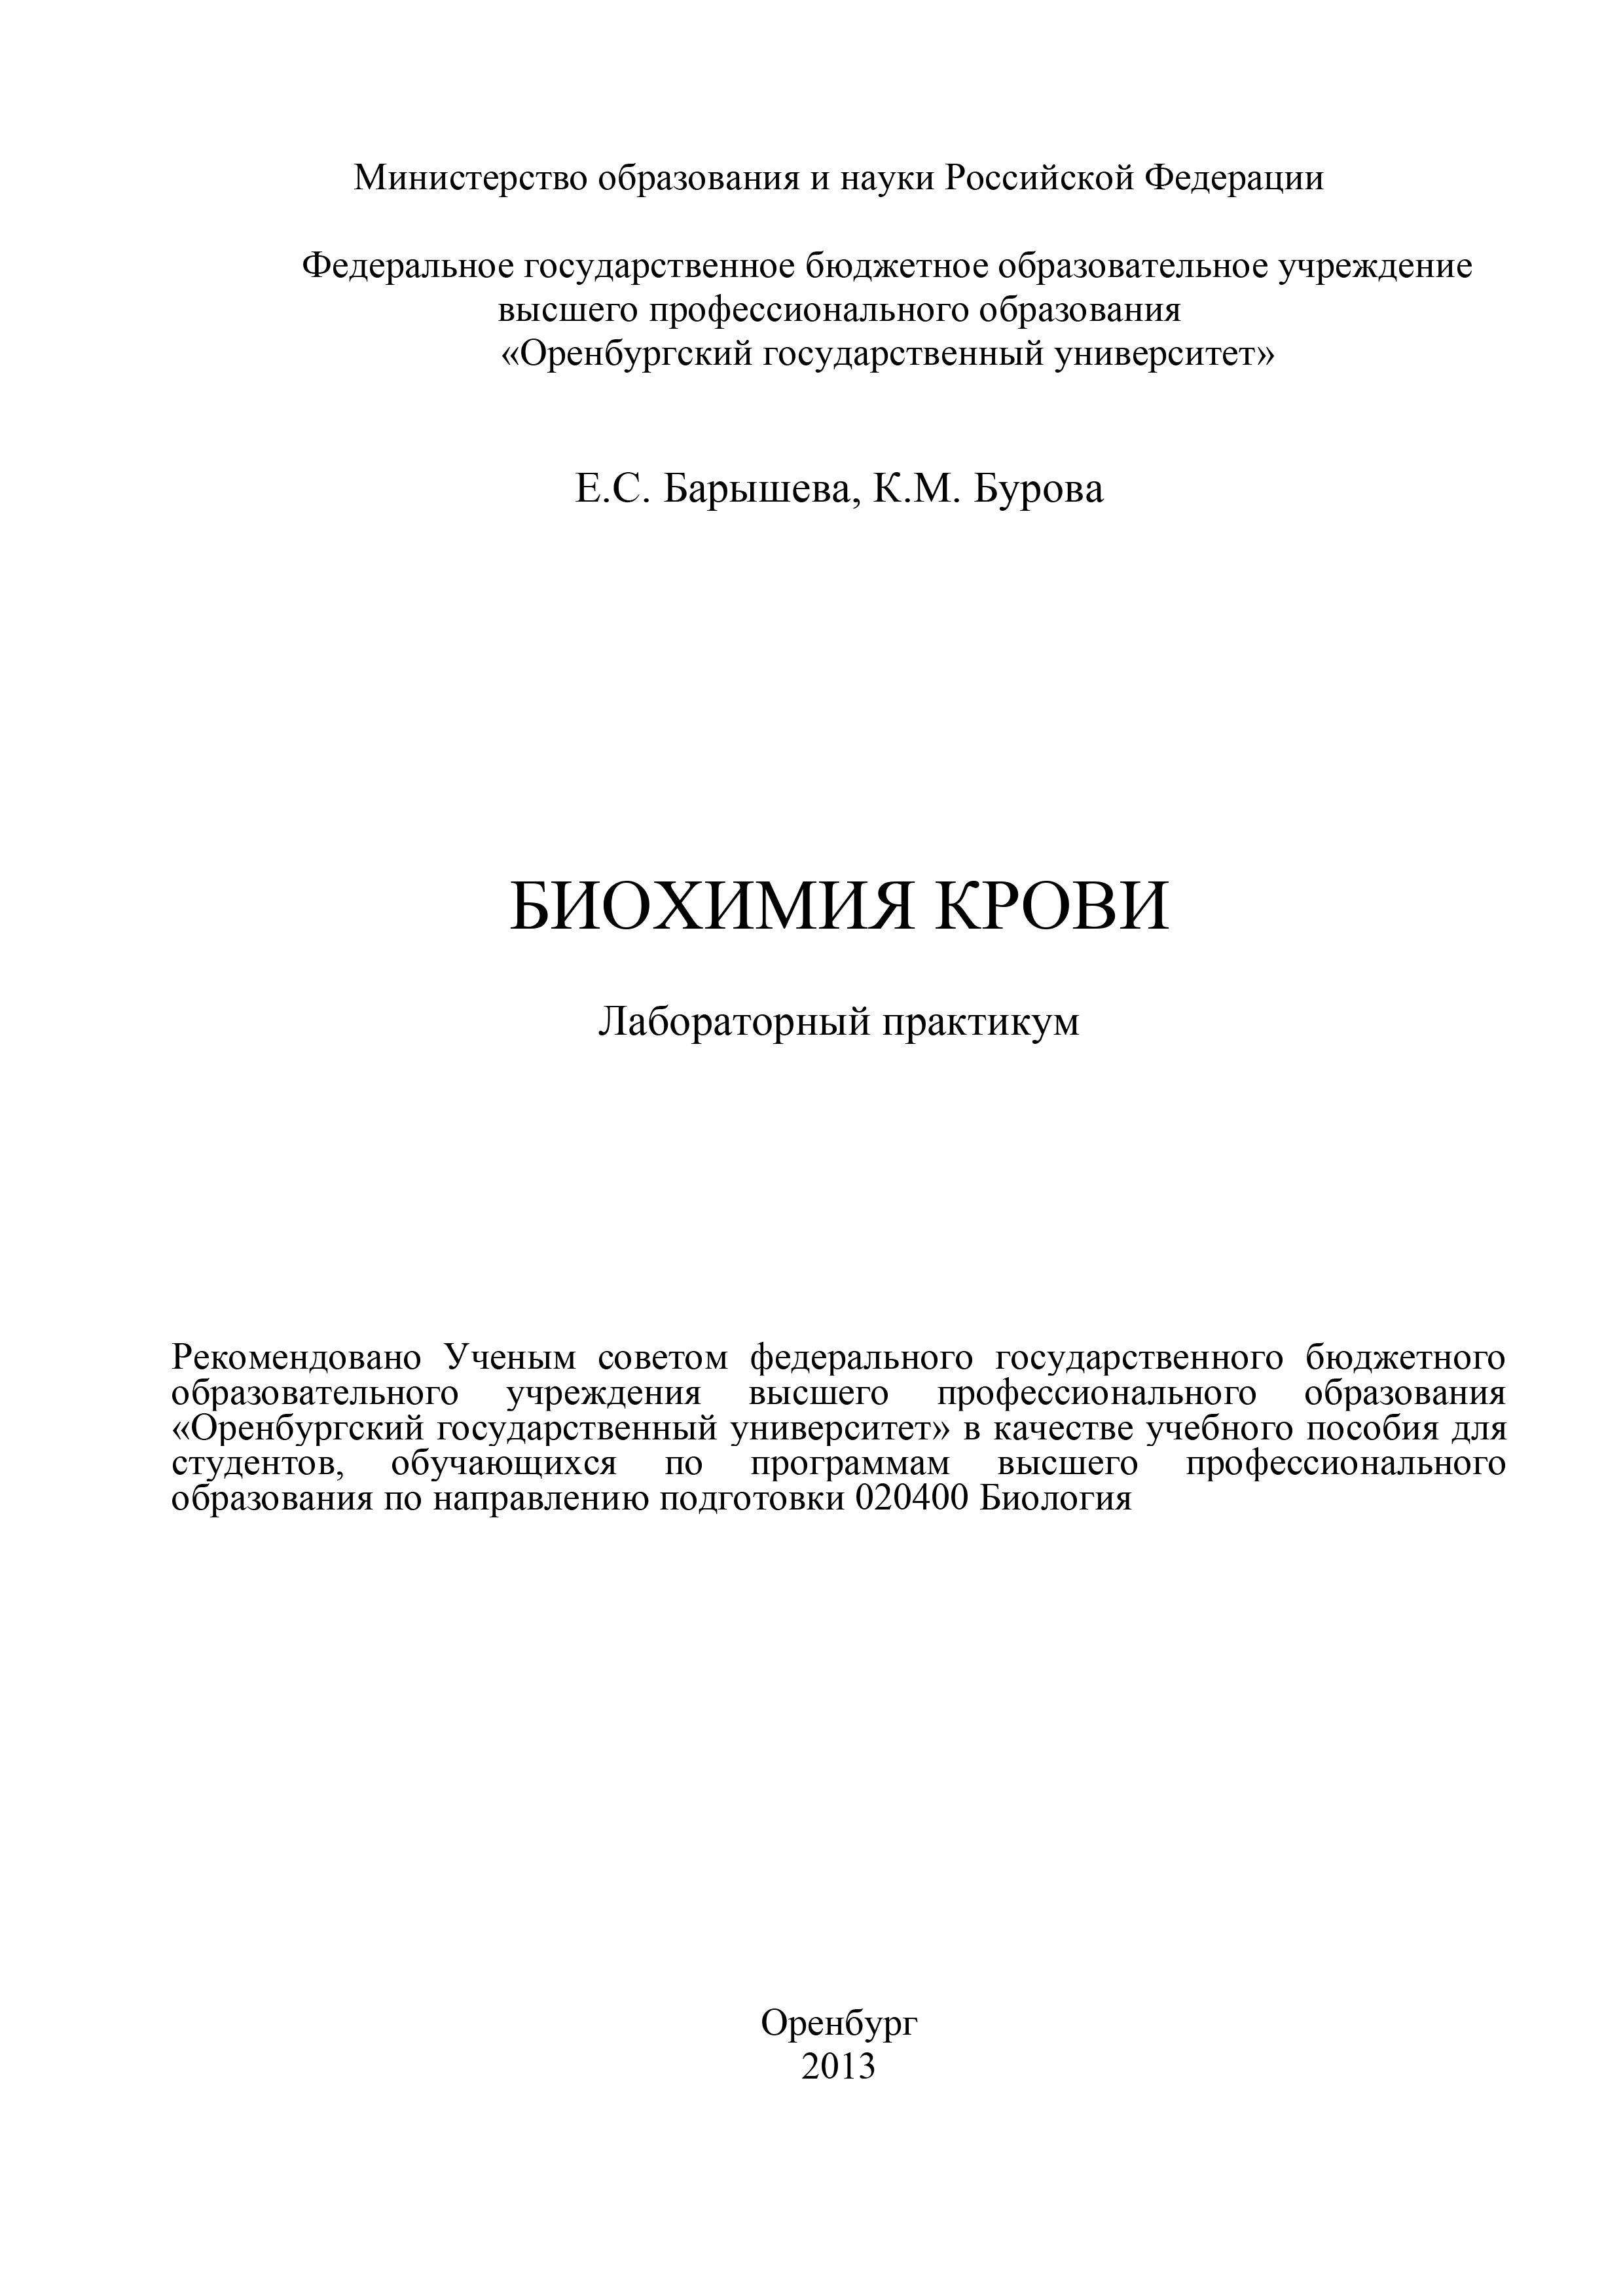 Е. Барышева Биохимия крови